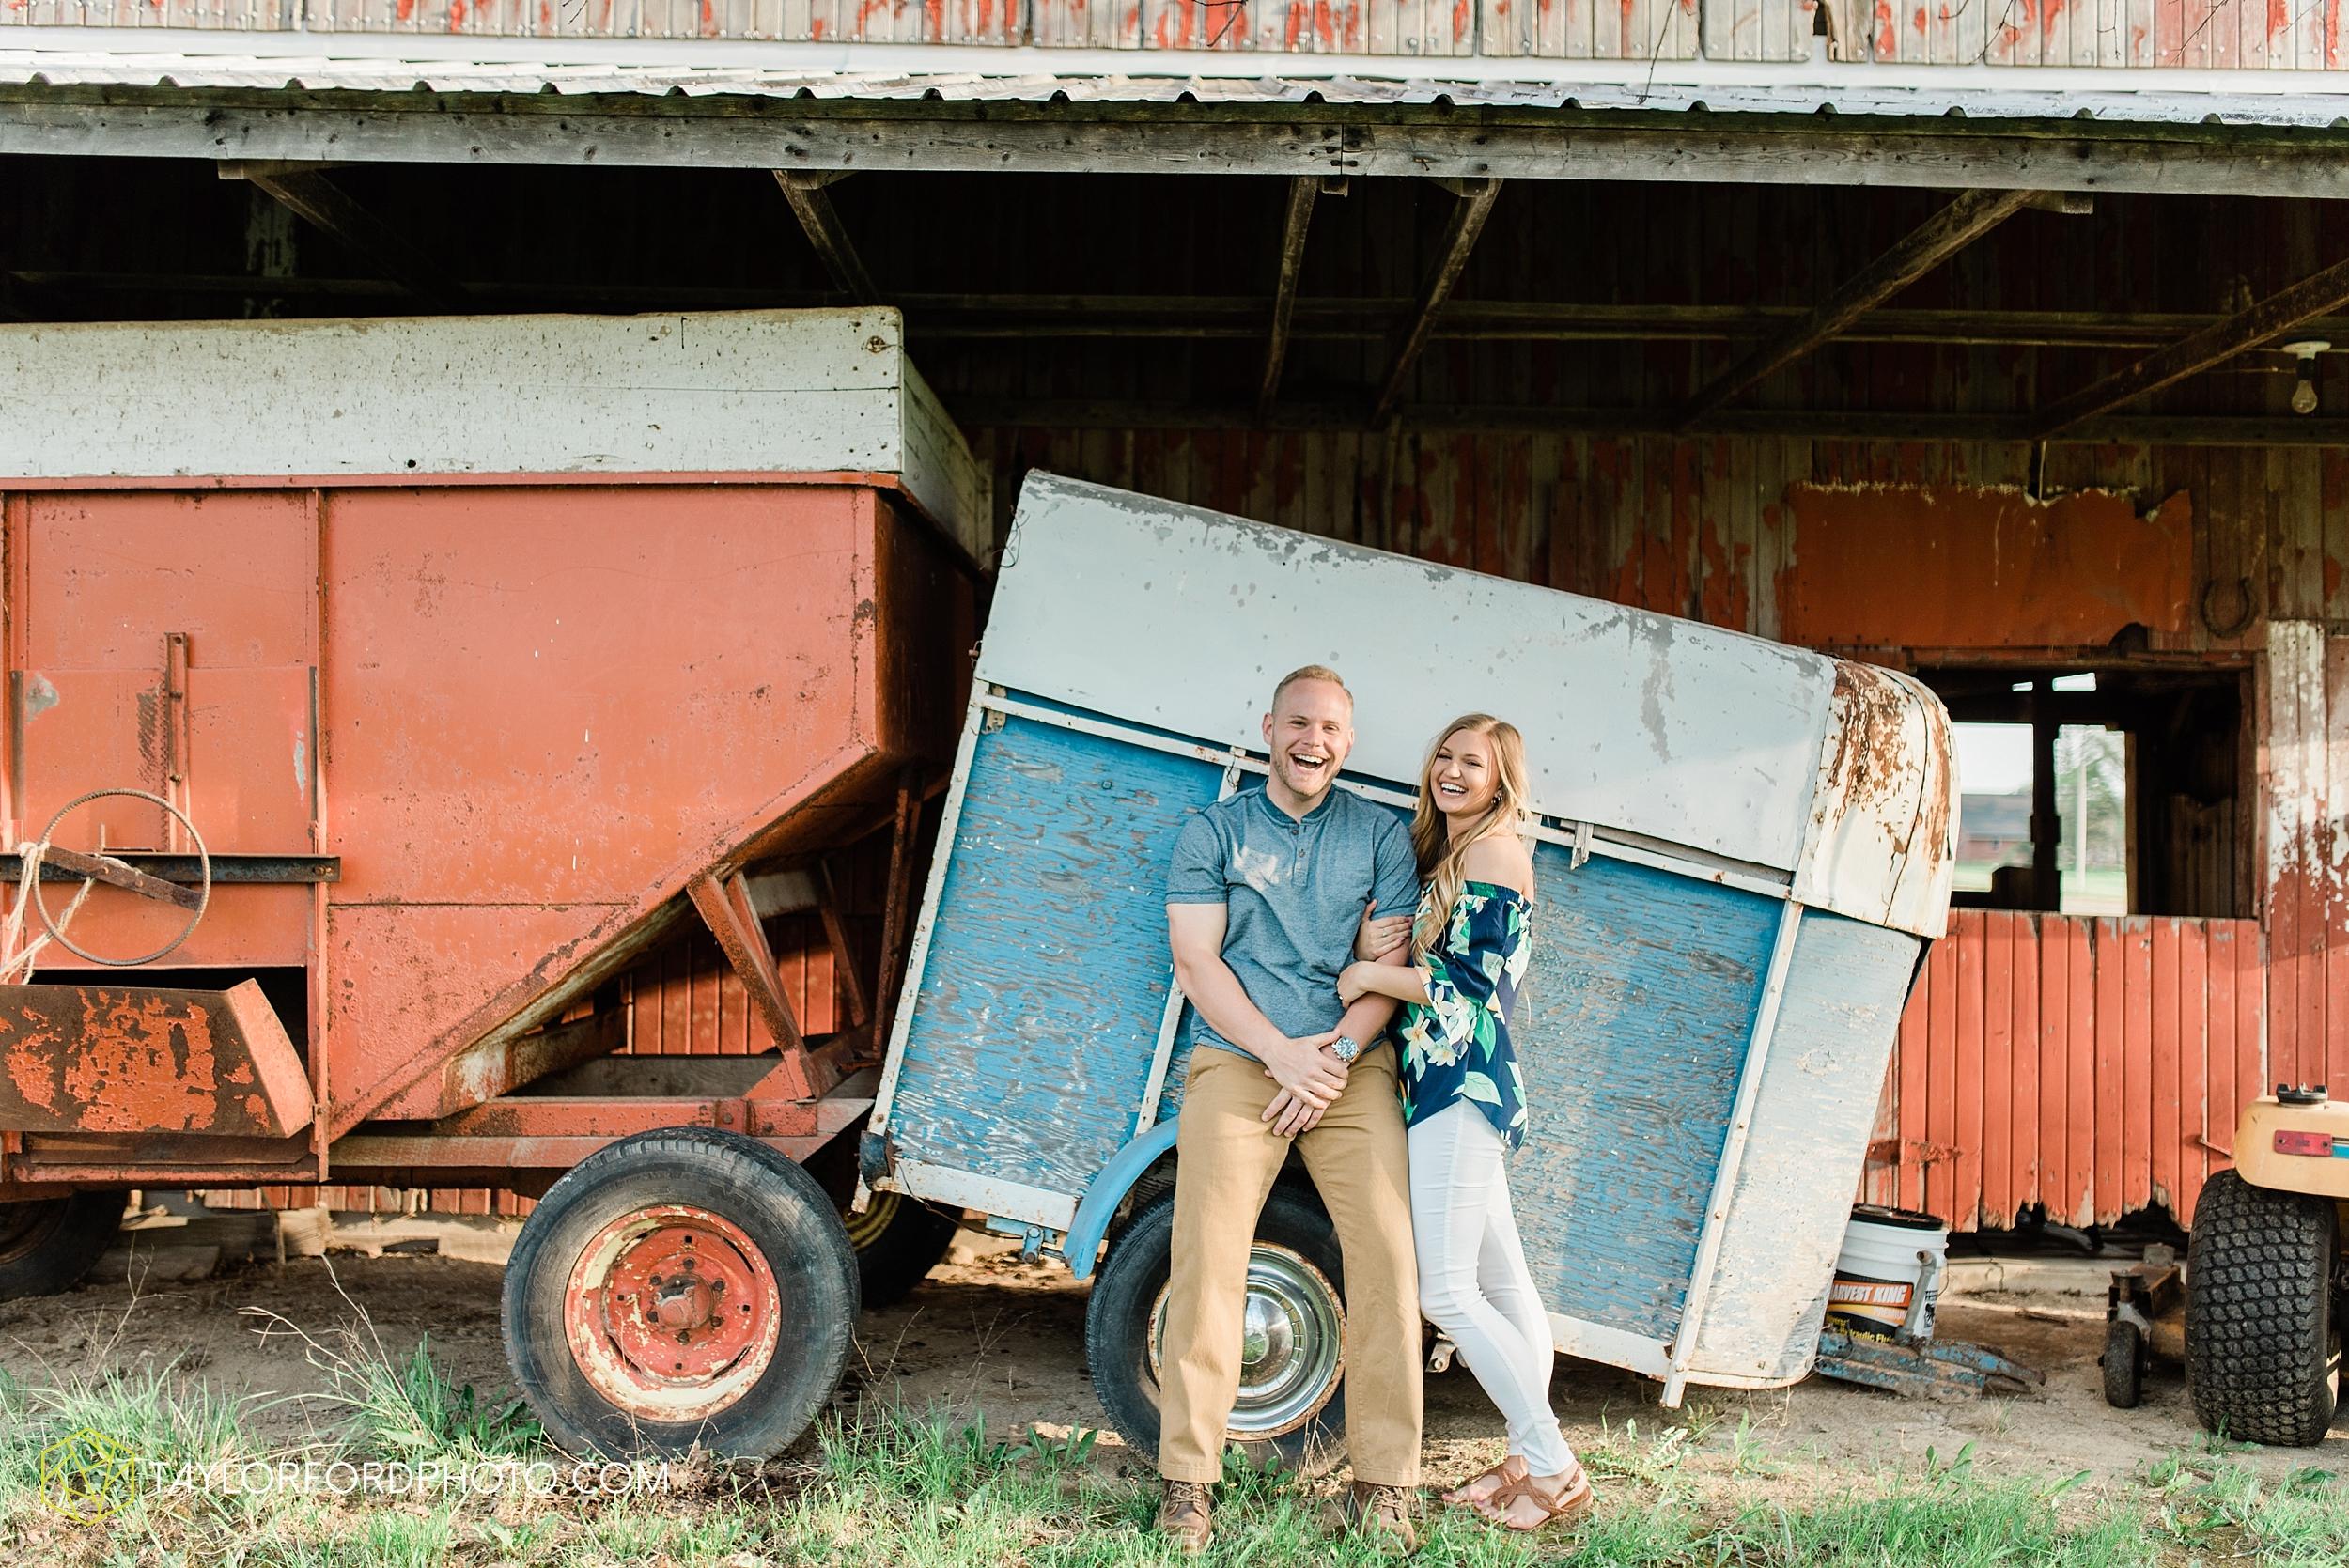 van-wert-ohio-spring-farm-engagement-photographer-photographer-Taylor-Ford-Photography_7107.jpg